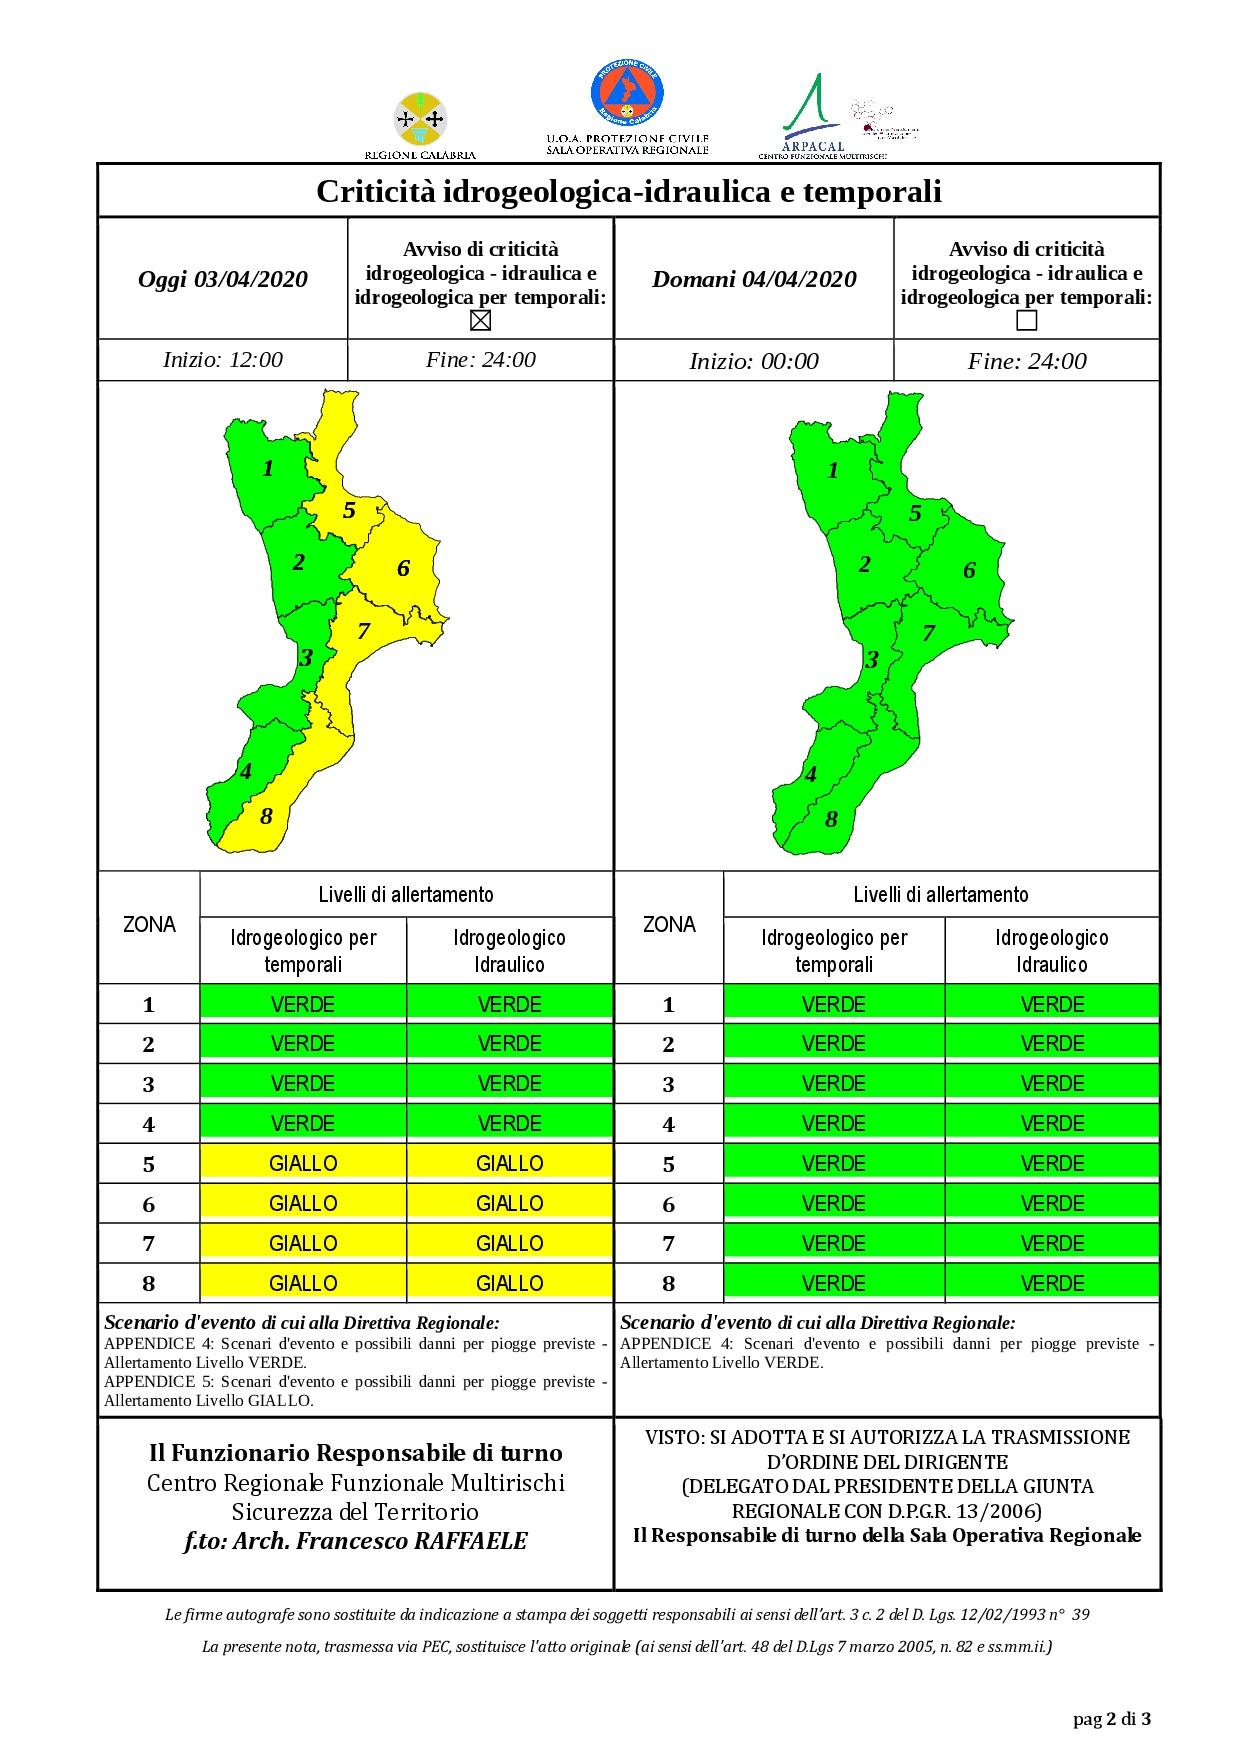 Criticità idrogeologica-idraulica e temporali in Calabria 03-04-2020